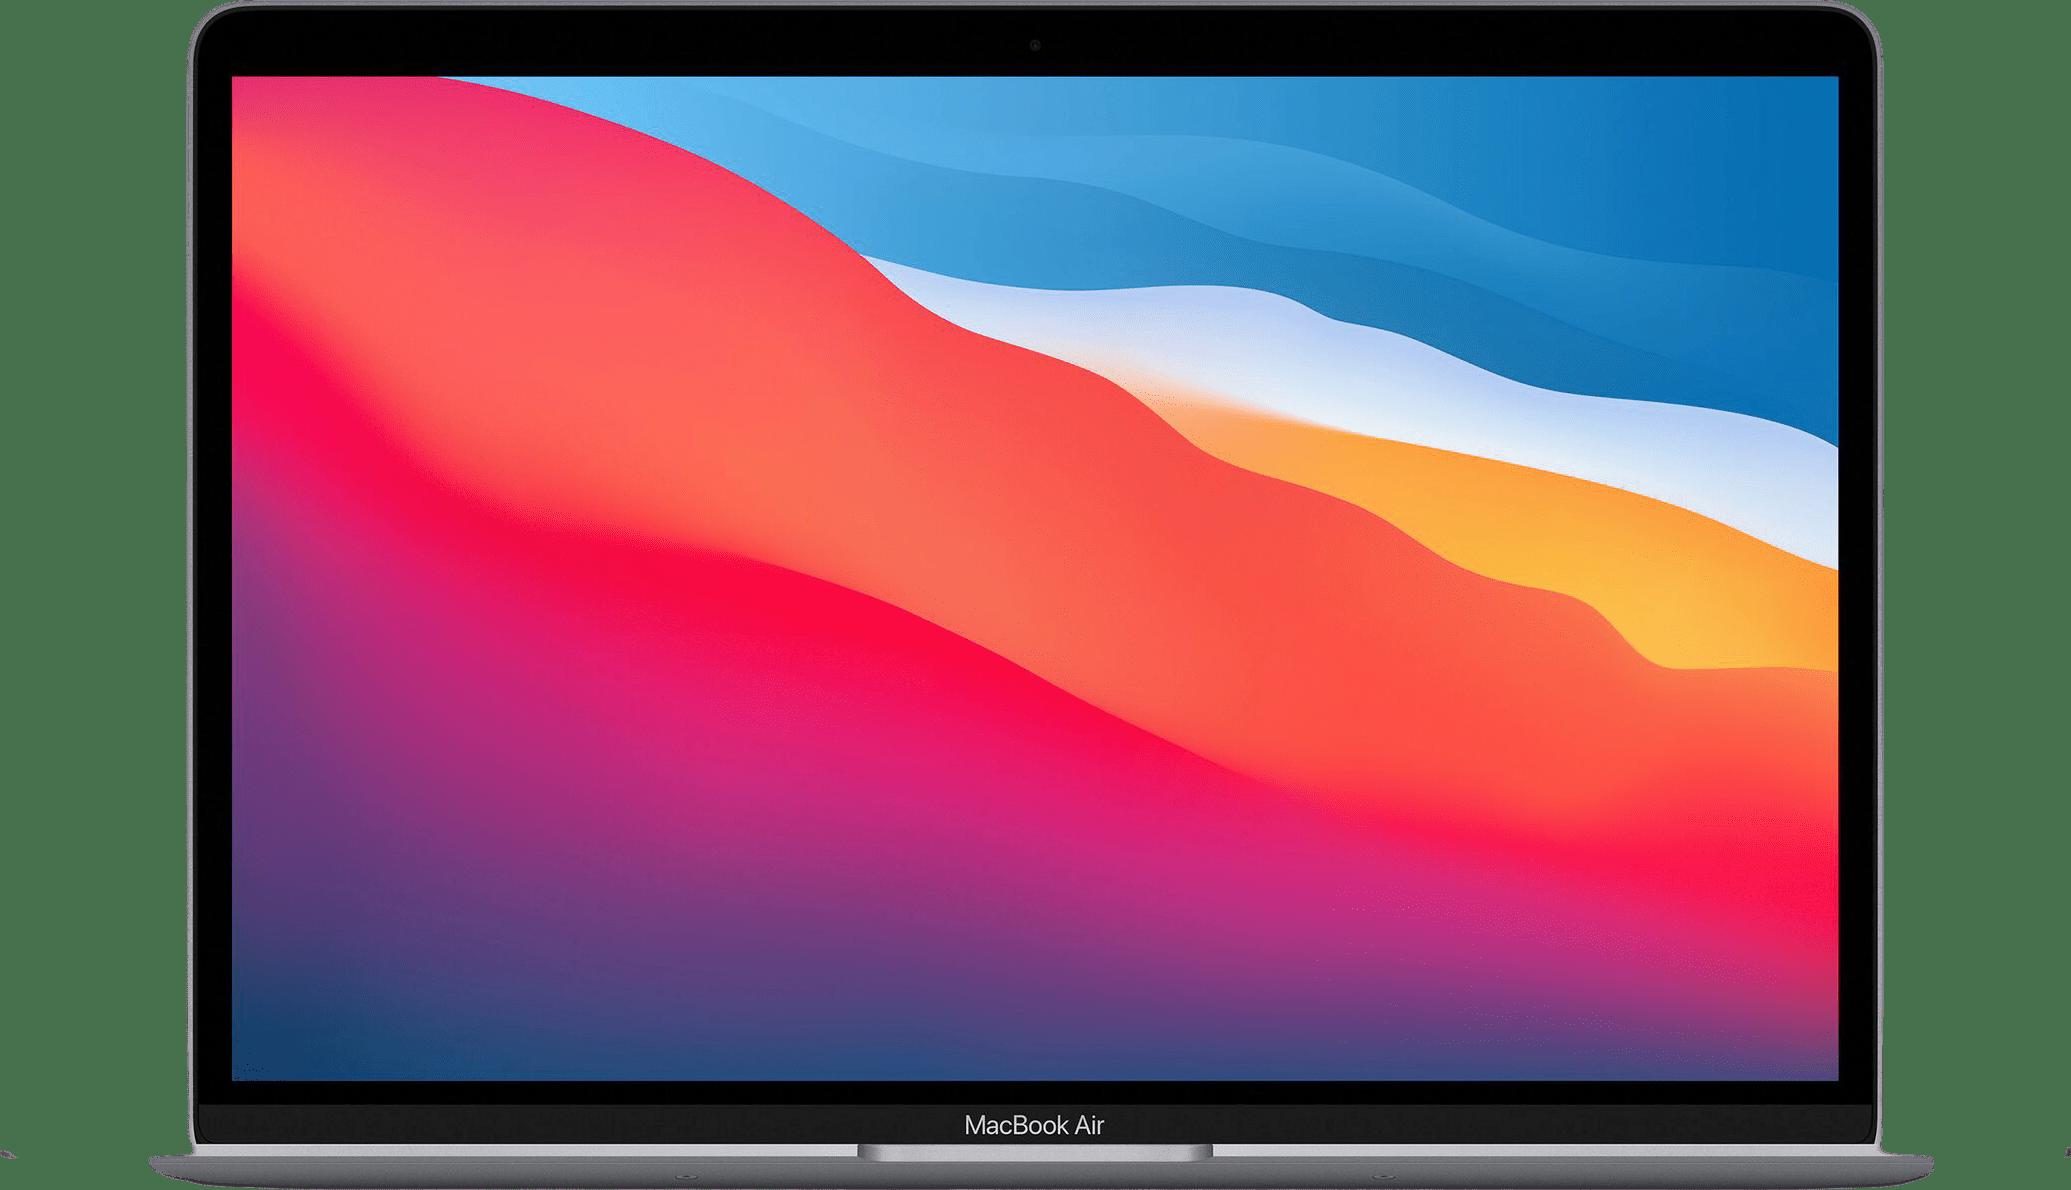 Apple MacBook Air (Late 2020) Laptop - Apple M1 - 8GB - 256GB SSD - Apple Integrated 7-core GPU